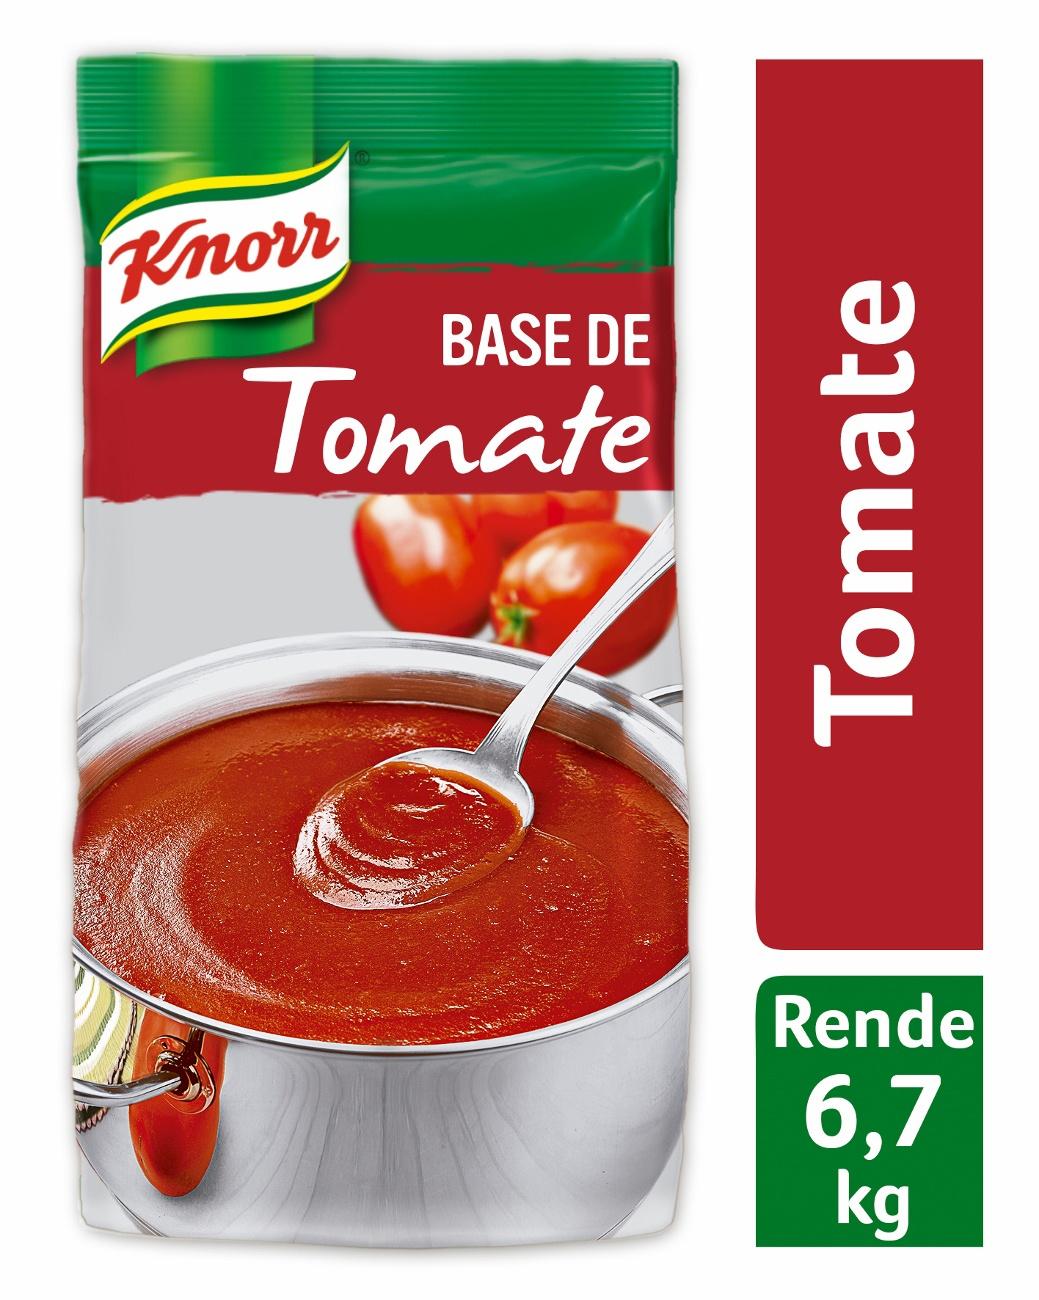 Molho de Tomate Knorr Desidratado 750g | 1 unidades